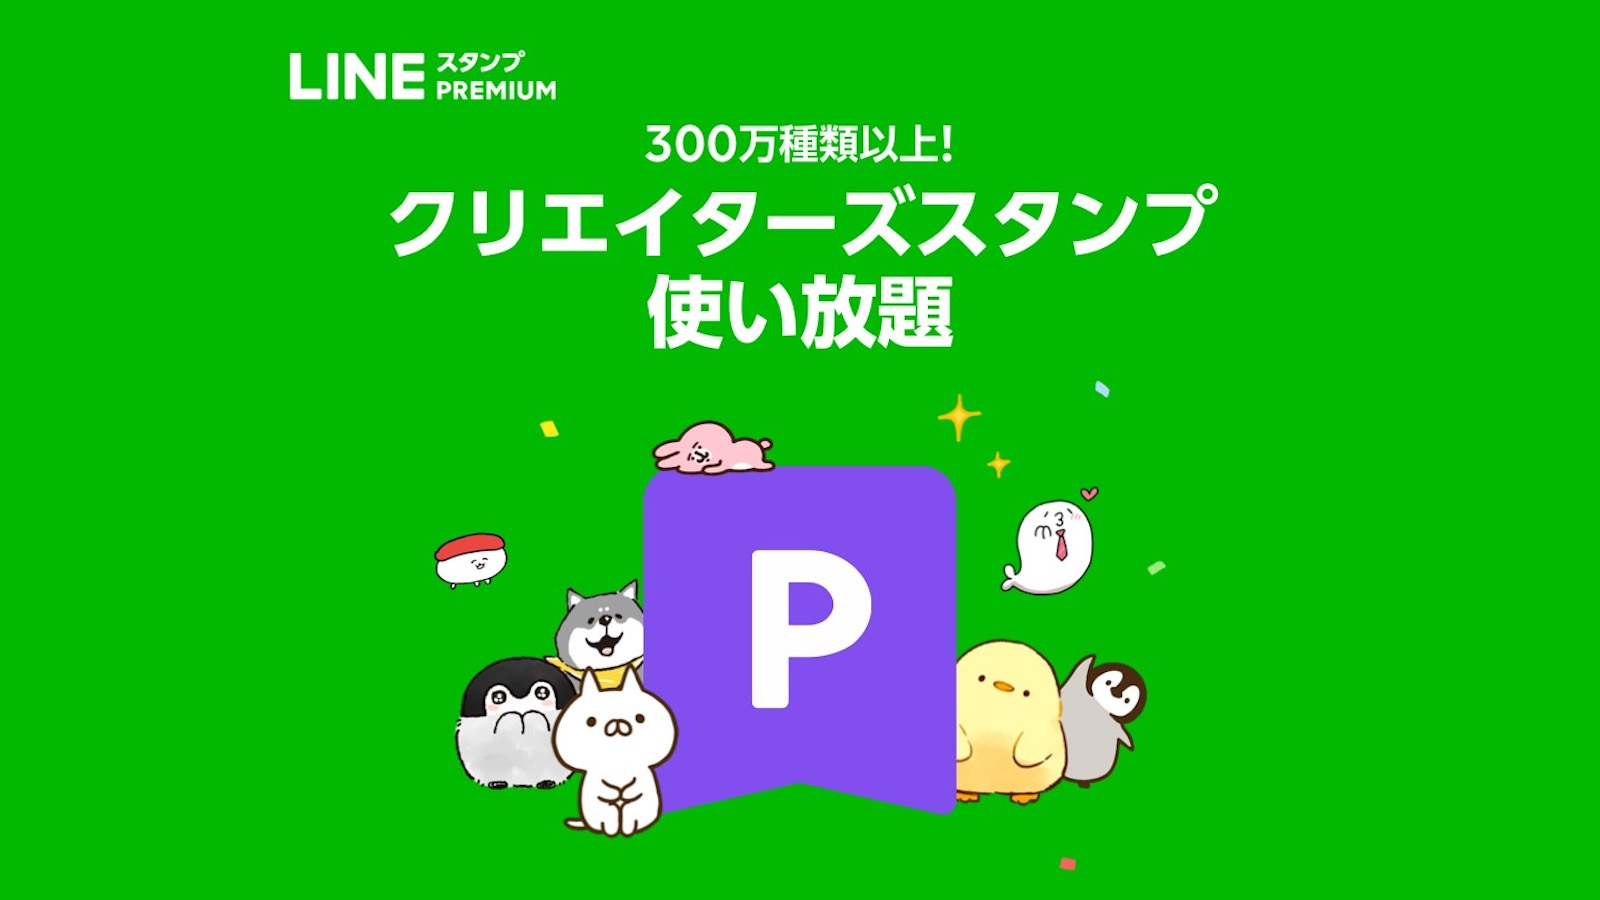 LINE-Stamp-Premium-1.jpg